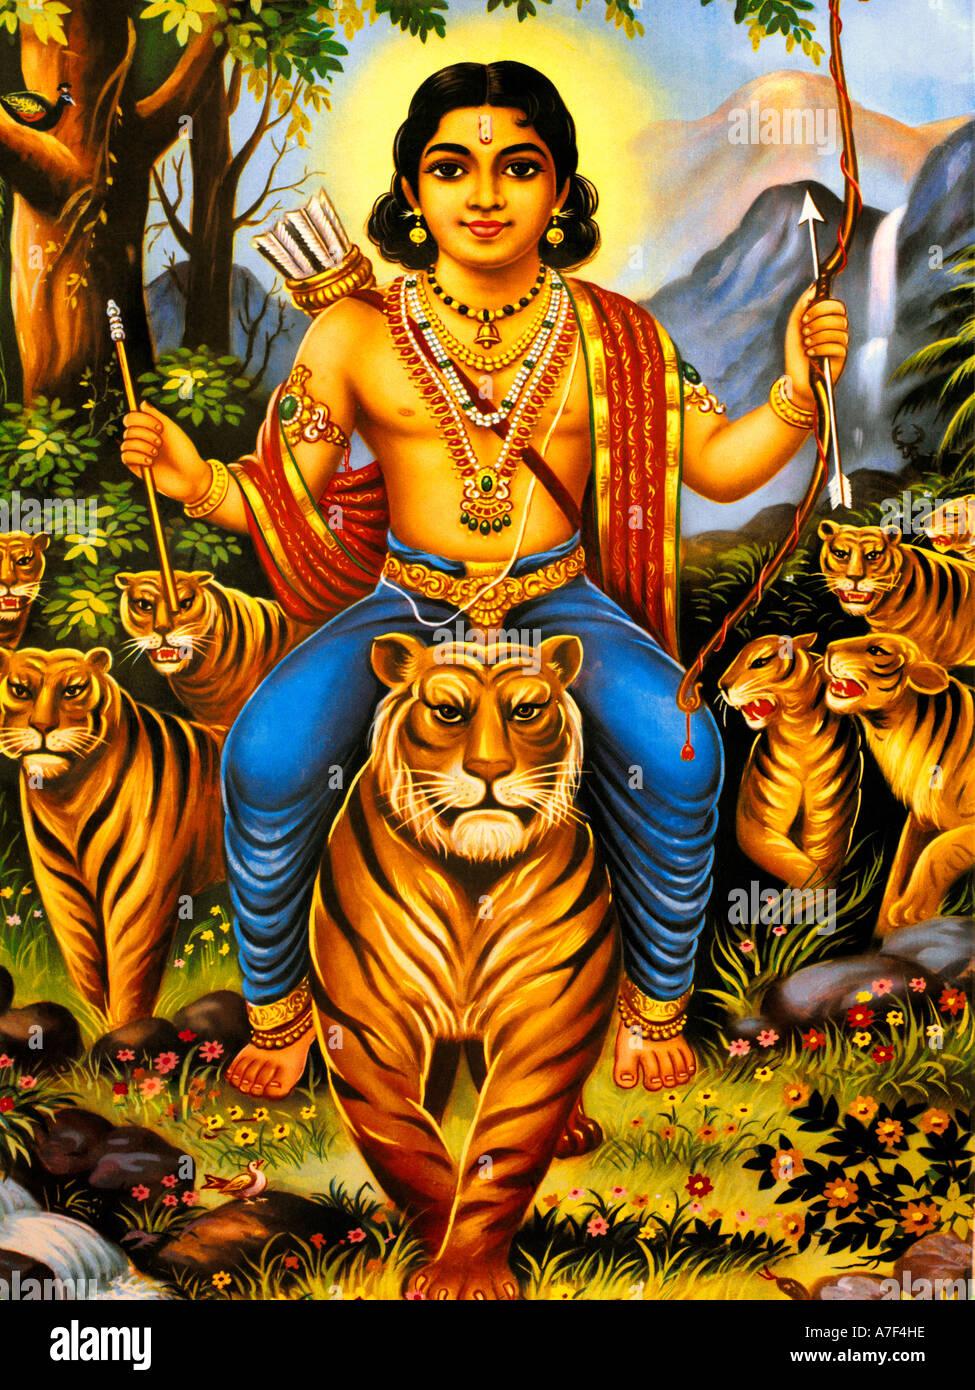 Ayopa Hindu God with Bow and Arrows Stock Photo, Royalty Free ...